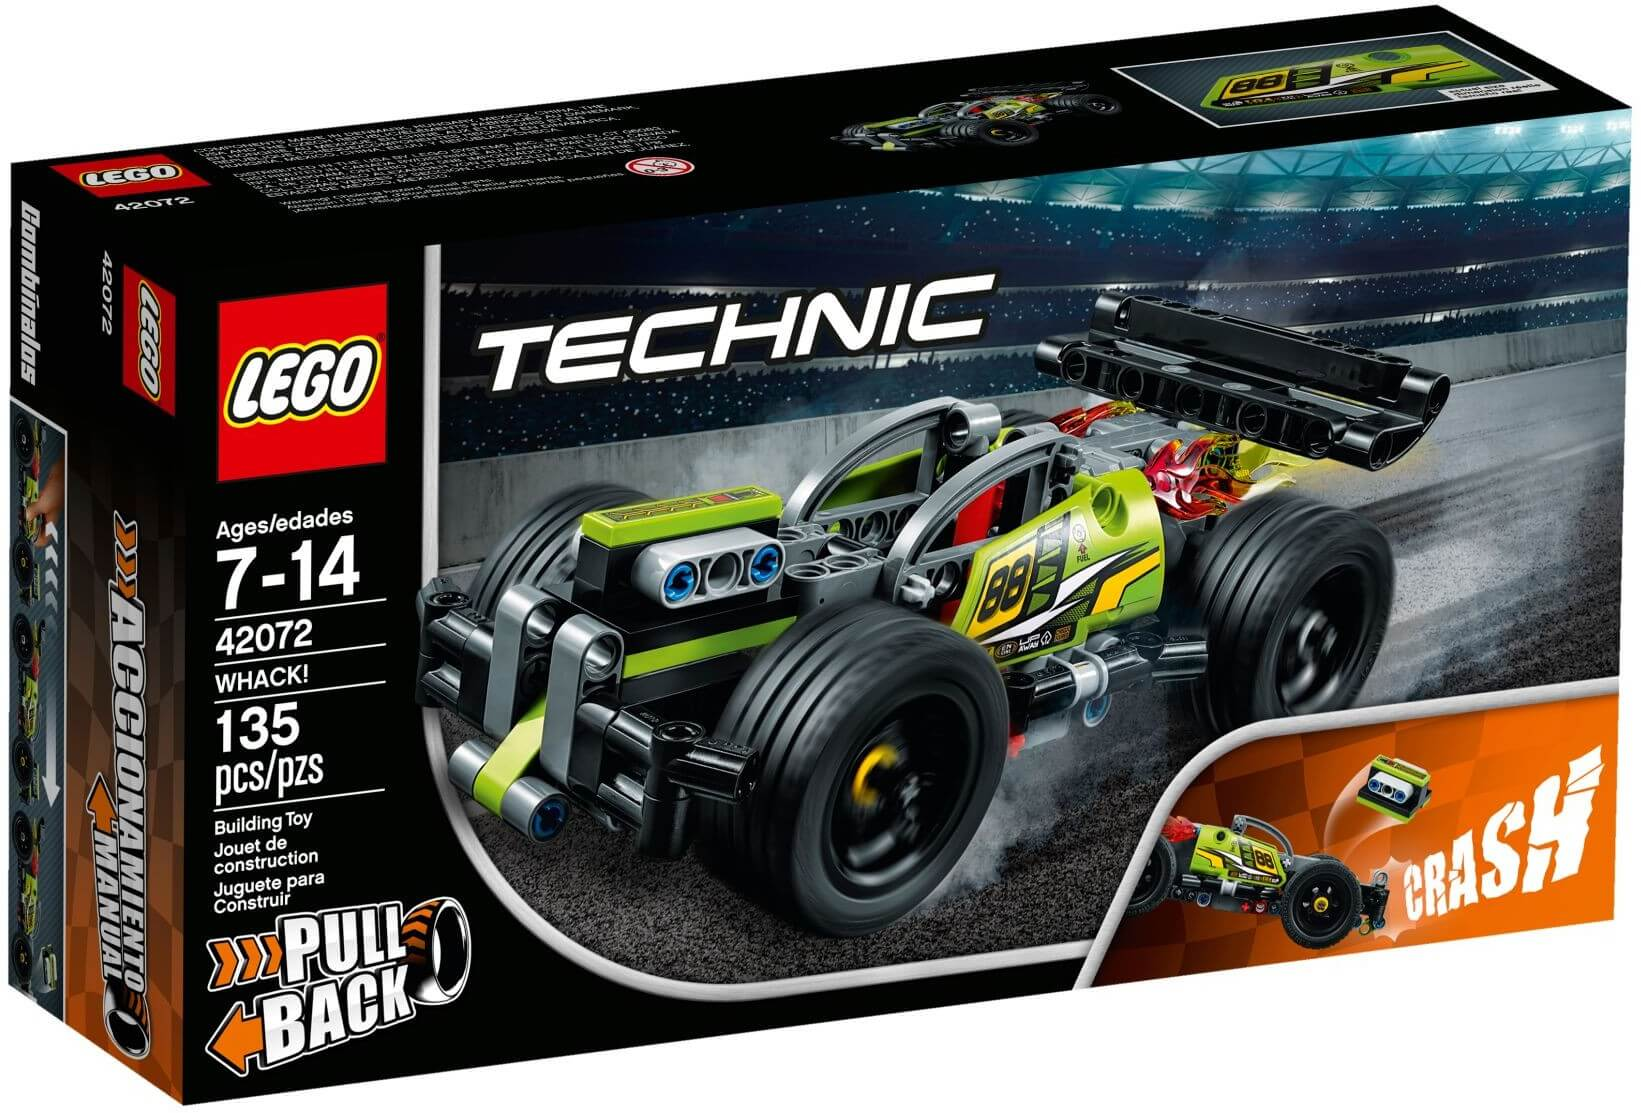 Mua đồ chơi LEGO 42072 - LEGO Technic 42072 - Siêu Xe WHACK! (LEGO Technic 42072 WHACK!)